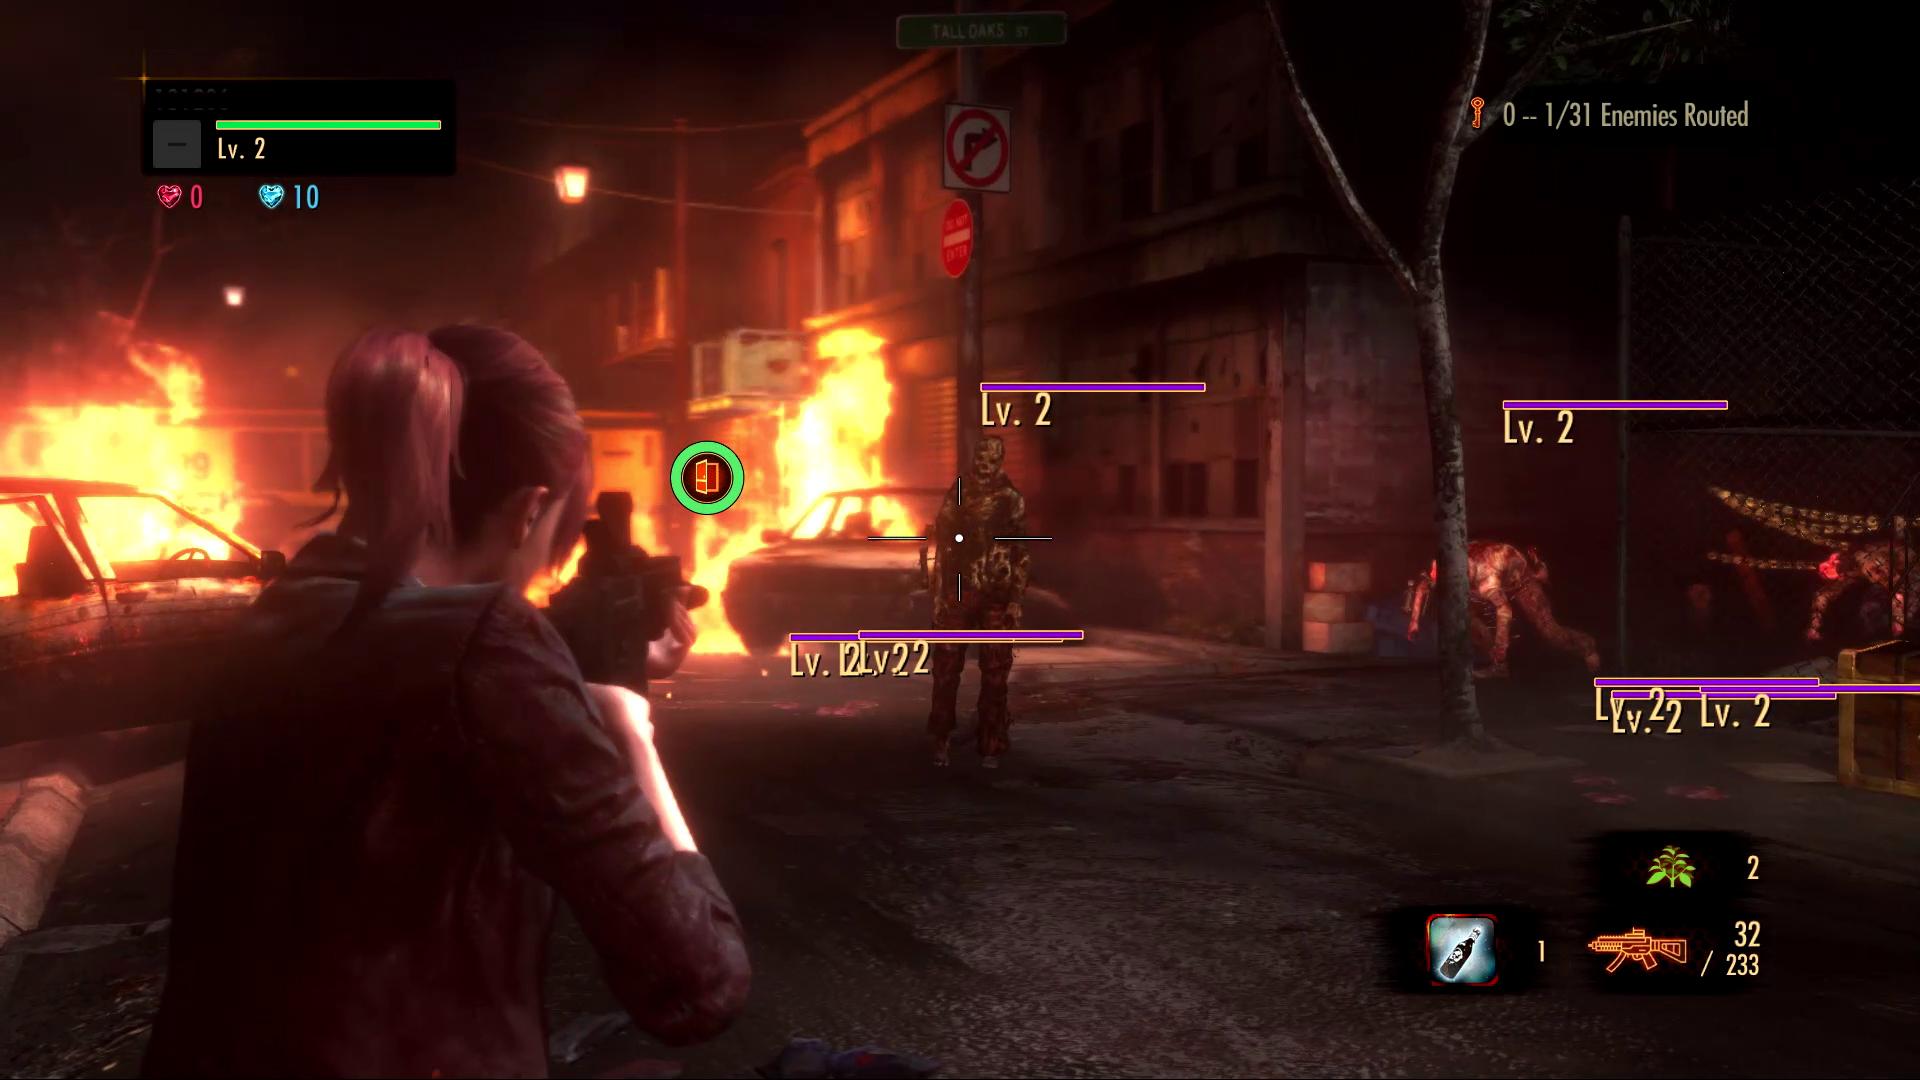 Resident Evil Revelations 2 ESPAÑOL PC Full + Update 2.1 (CODEX) + REPACK 3 DVD5 (JPW) 9